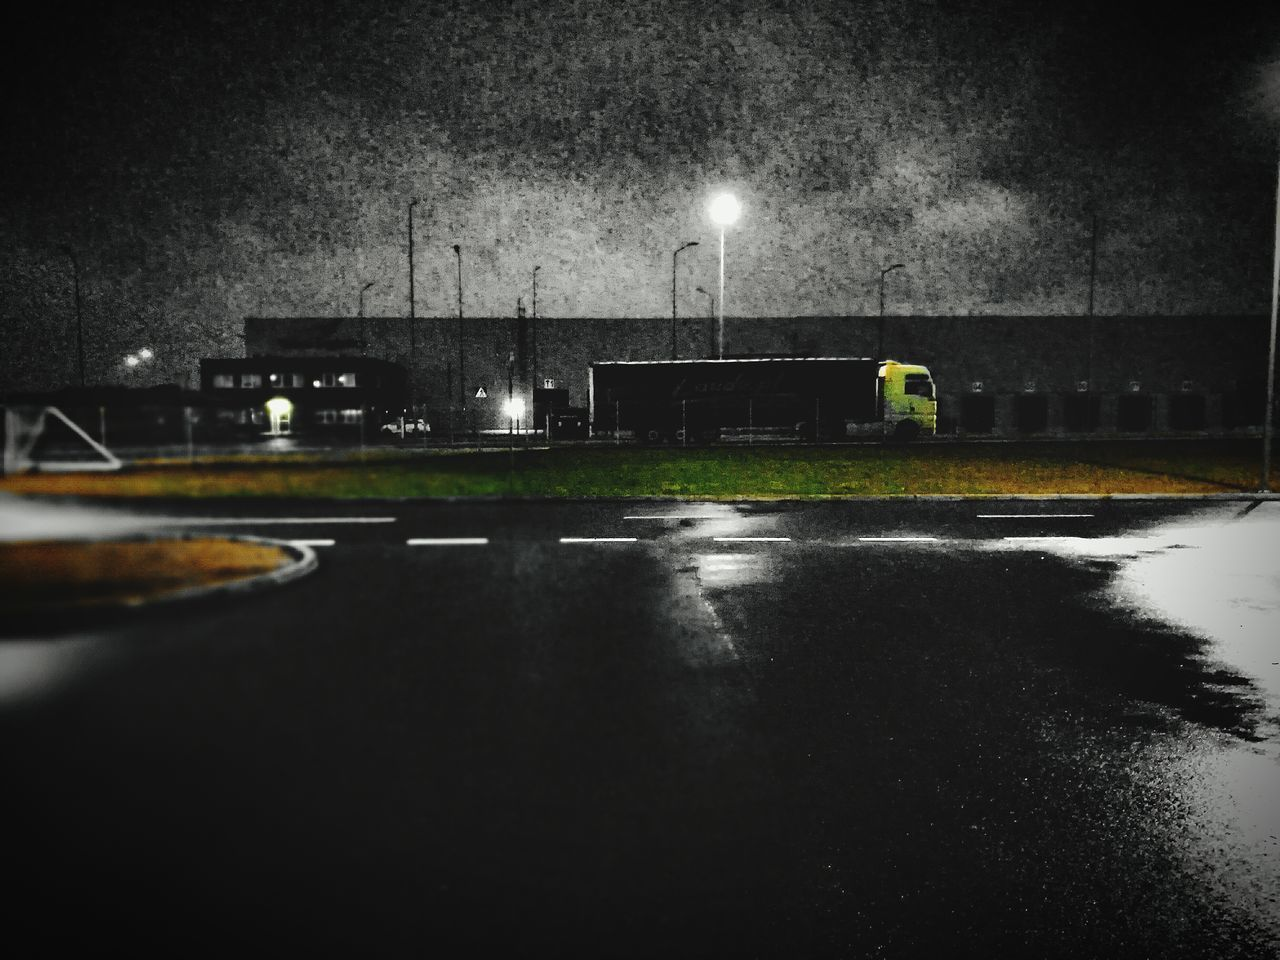 At Night In Work Trailer Big Car Moonlight Midnight Truck Rainy Days Rain